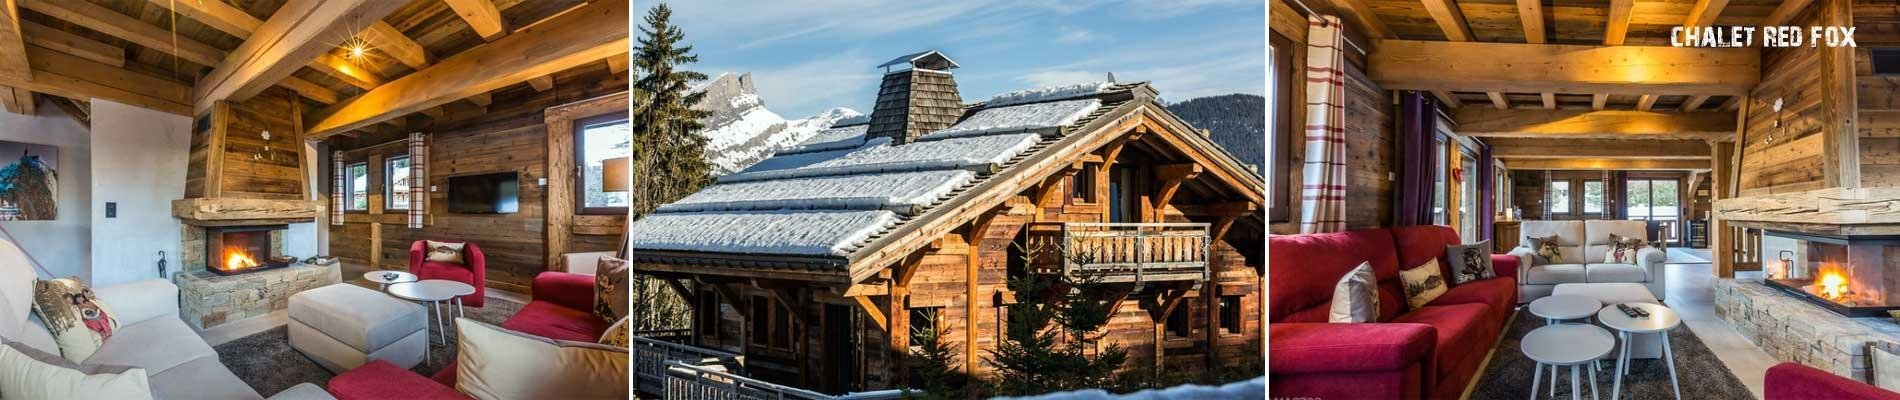 Chalet Saint Gervais wintersport ski vakantie hameau du renard blanc